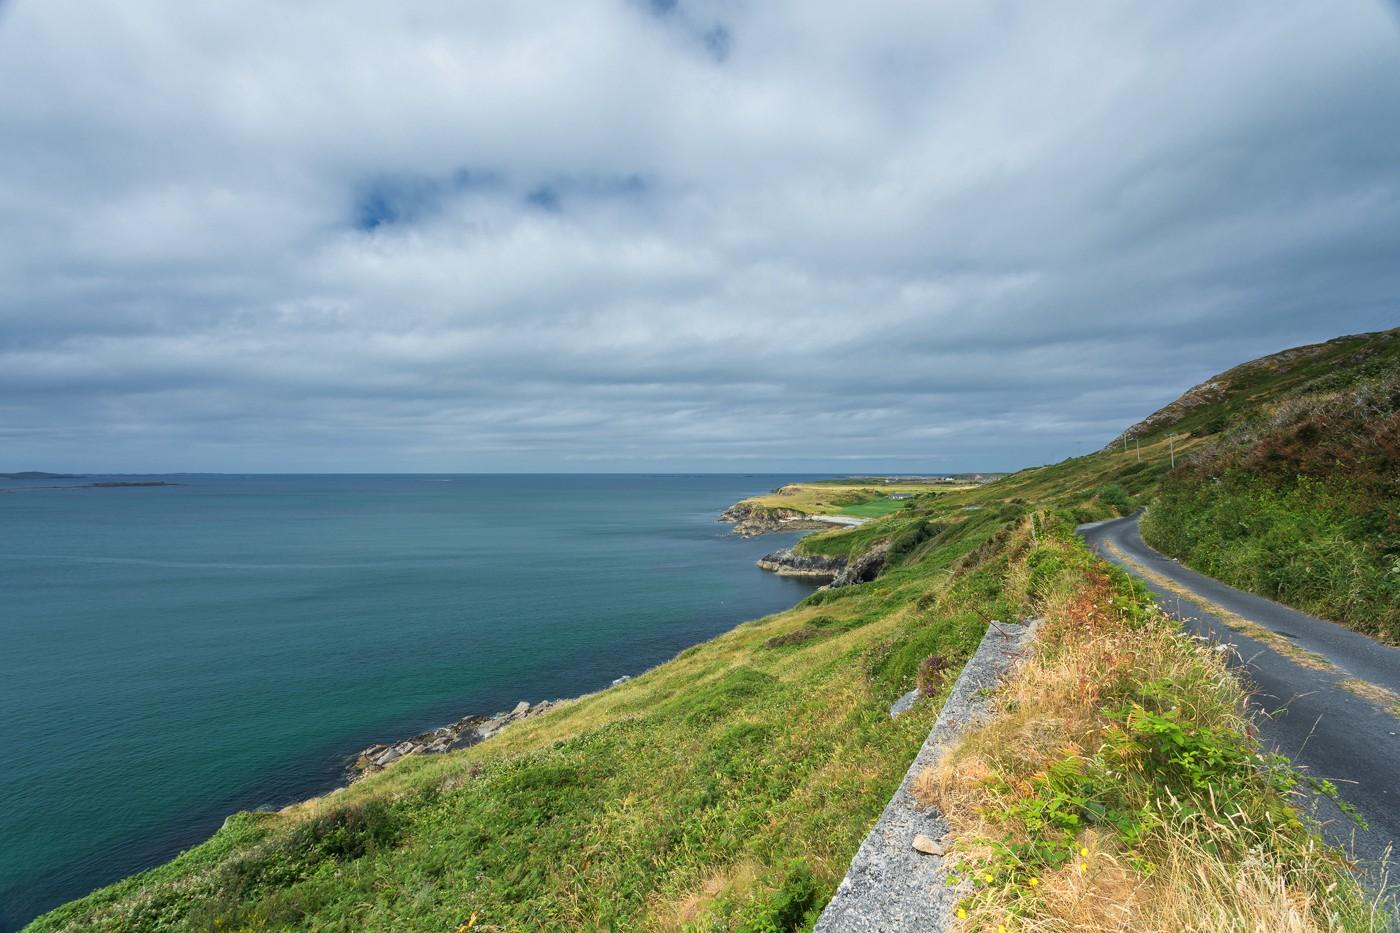 Sky Road on Ireland's Wild Atlantic Way